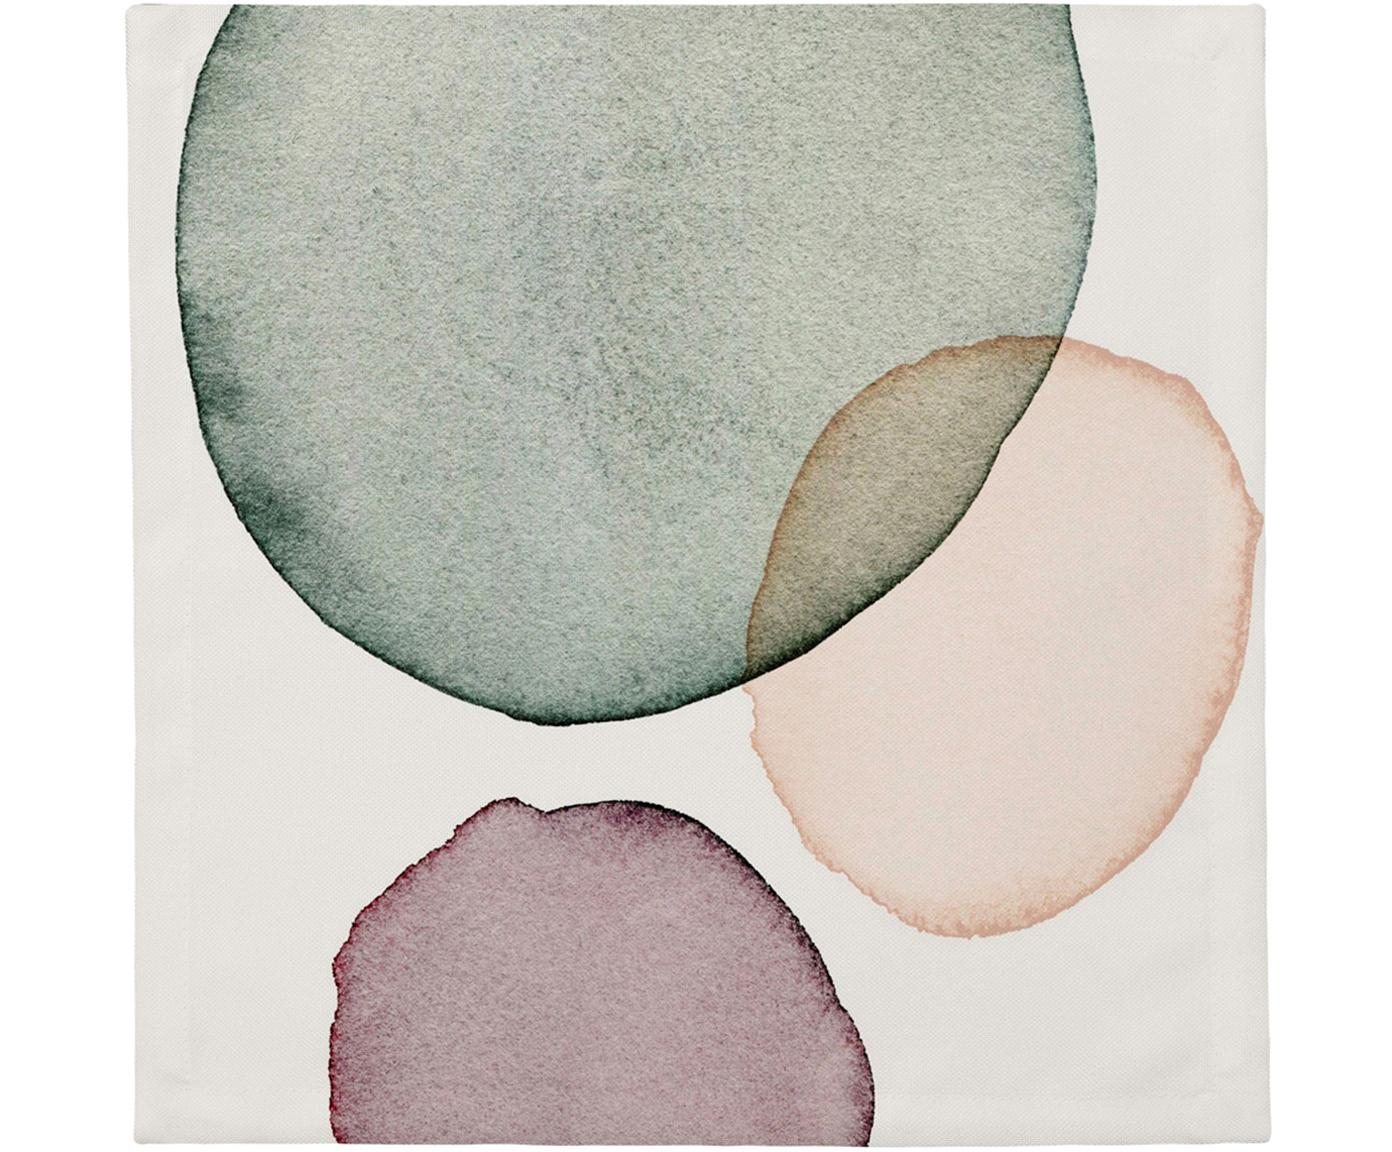 Stoffen servetten Calm, 4 stuks, Katoen, Wit, groen, lila, zalmkleurig, 40 x 40 cm